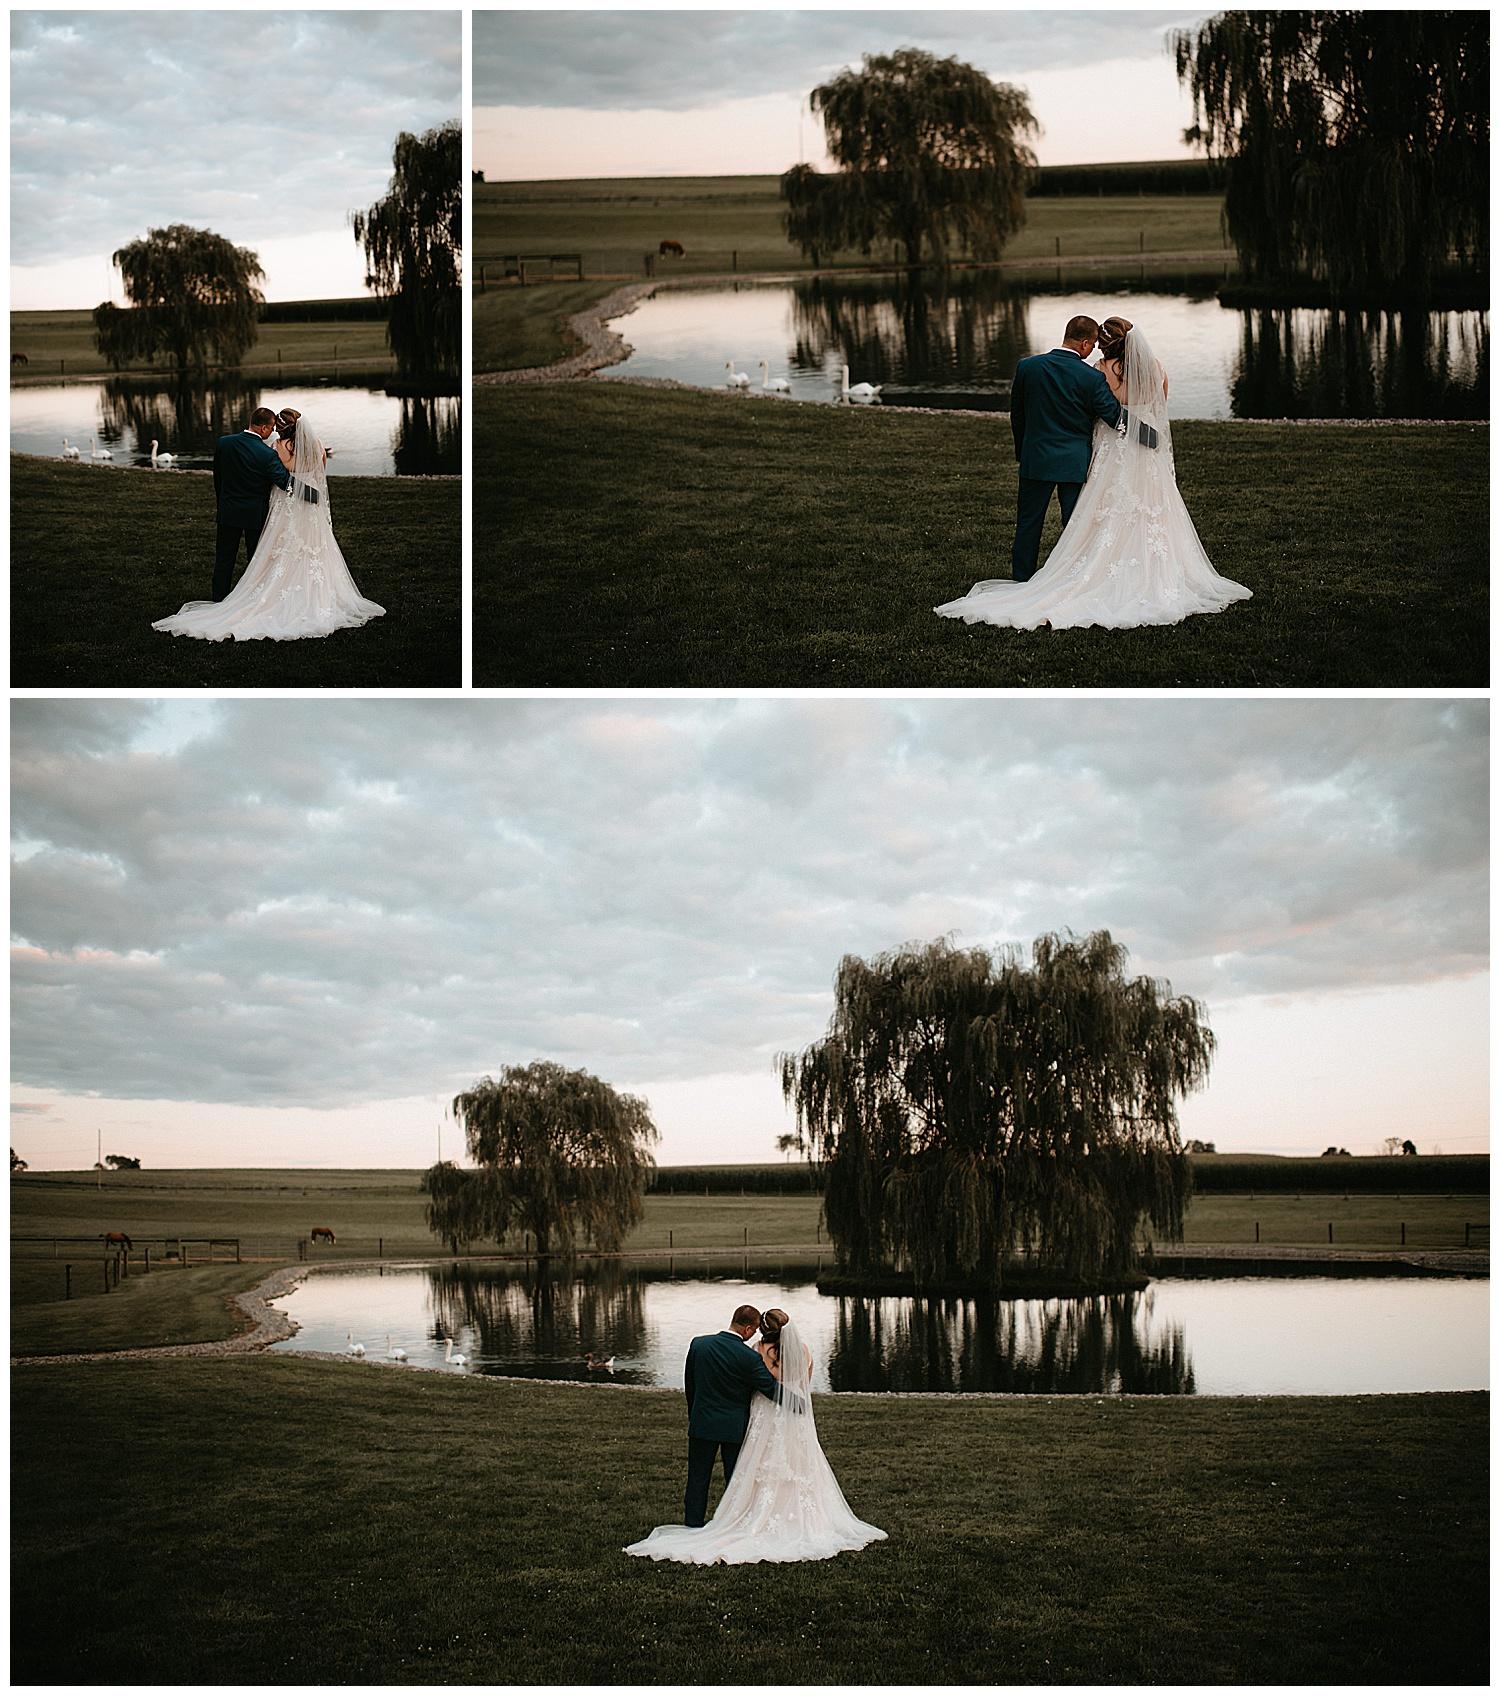 NEPA-Bloomgsburg-Wedding-Photographer-at-The-Barn-at-Greystone-Farms-Watsontown-PA_0101.jpg